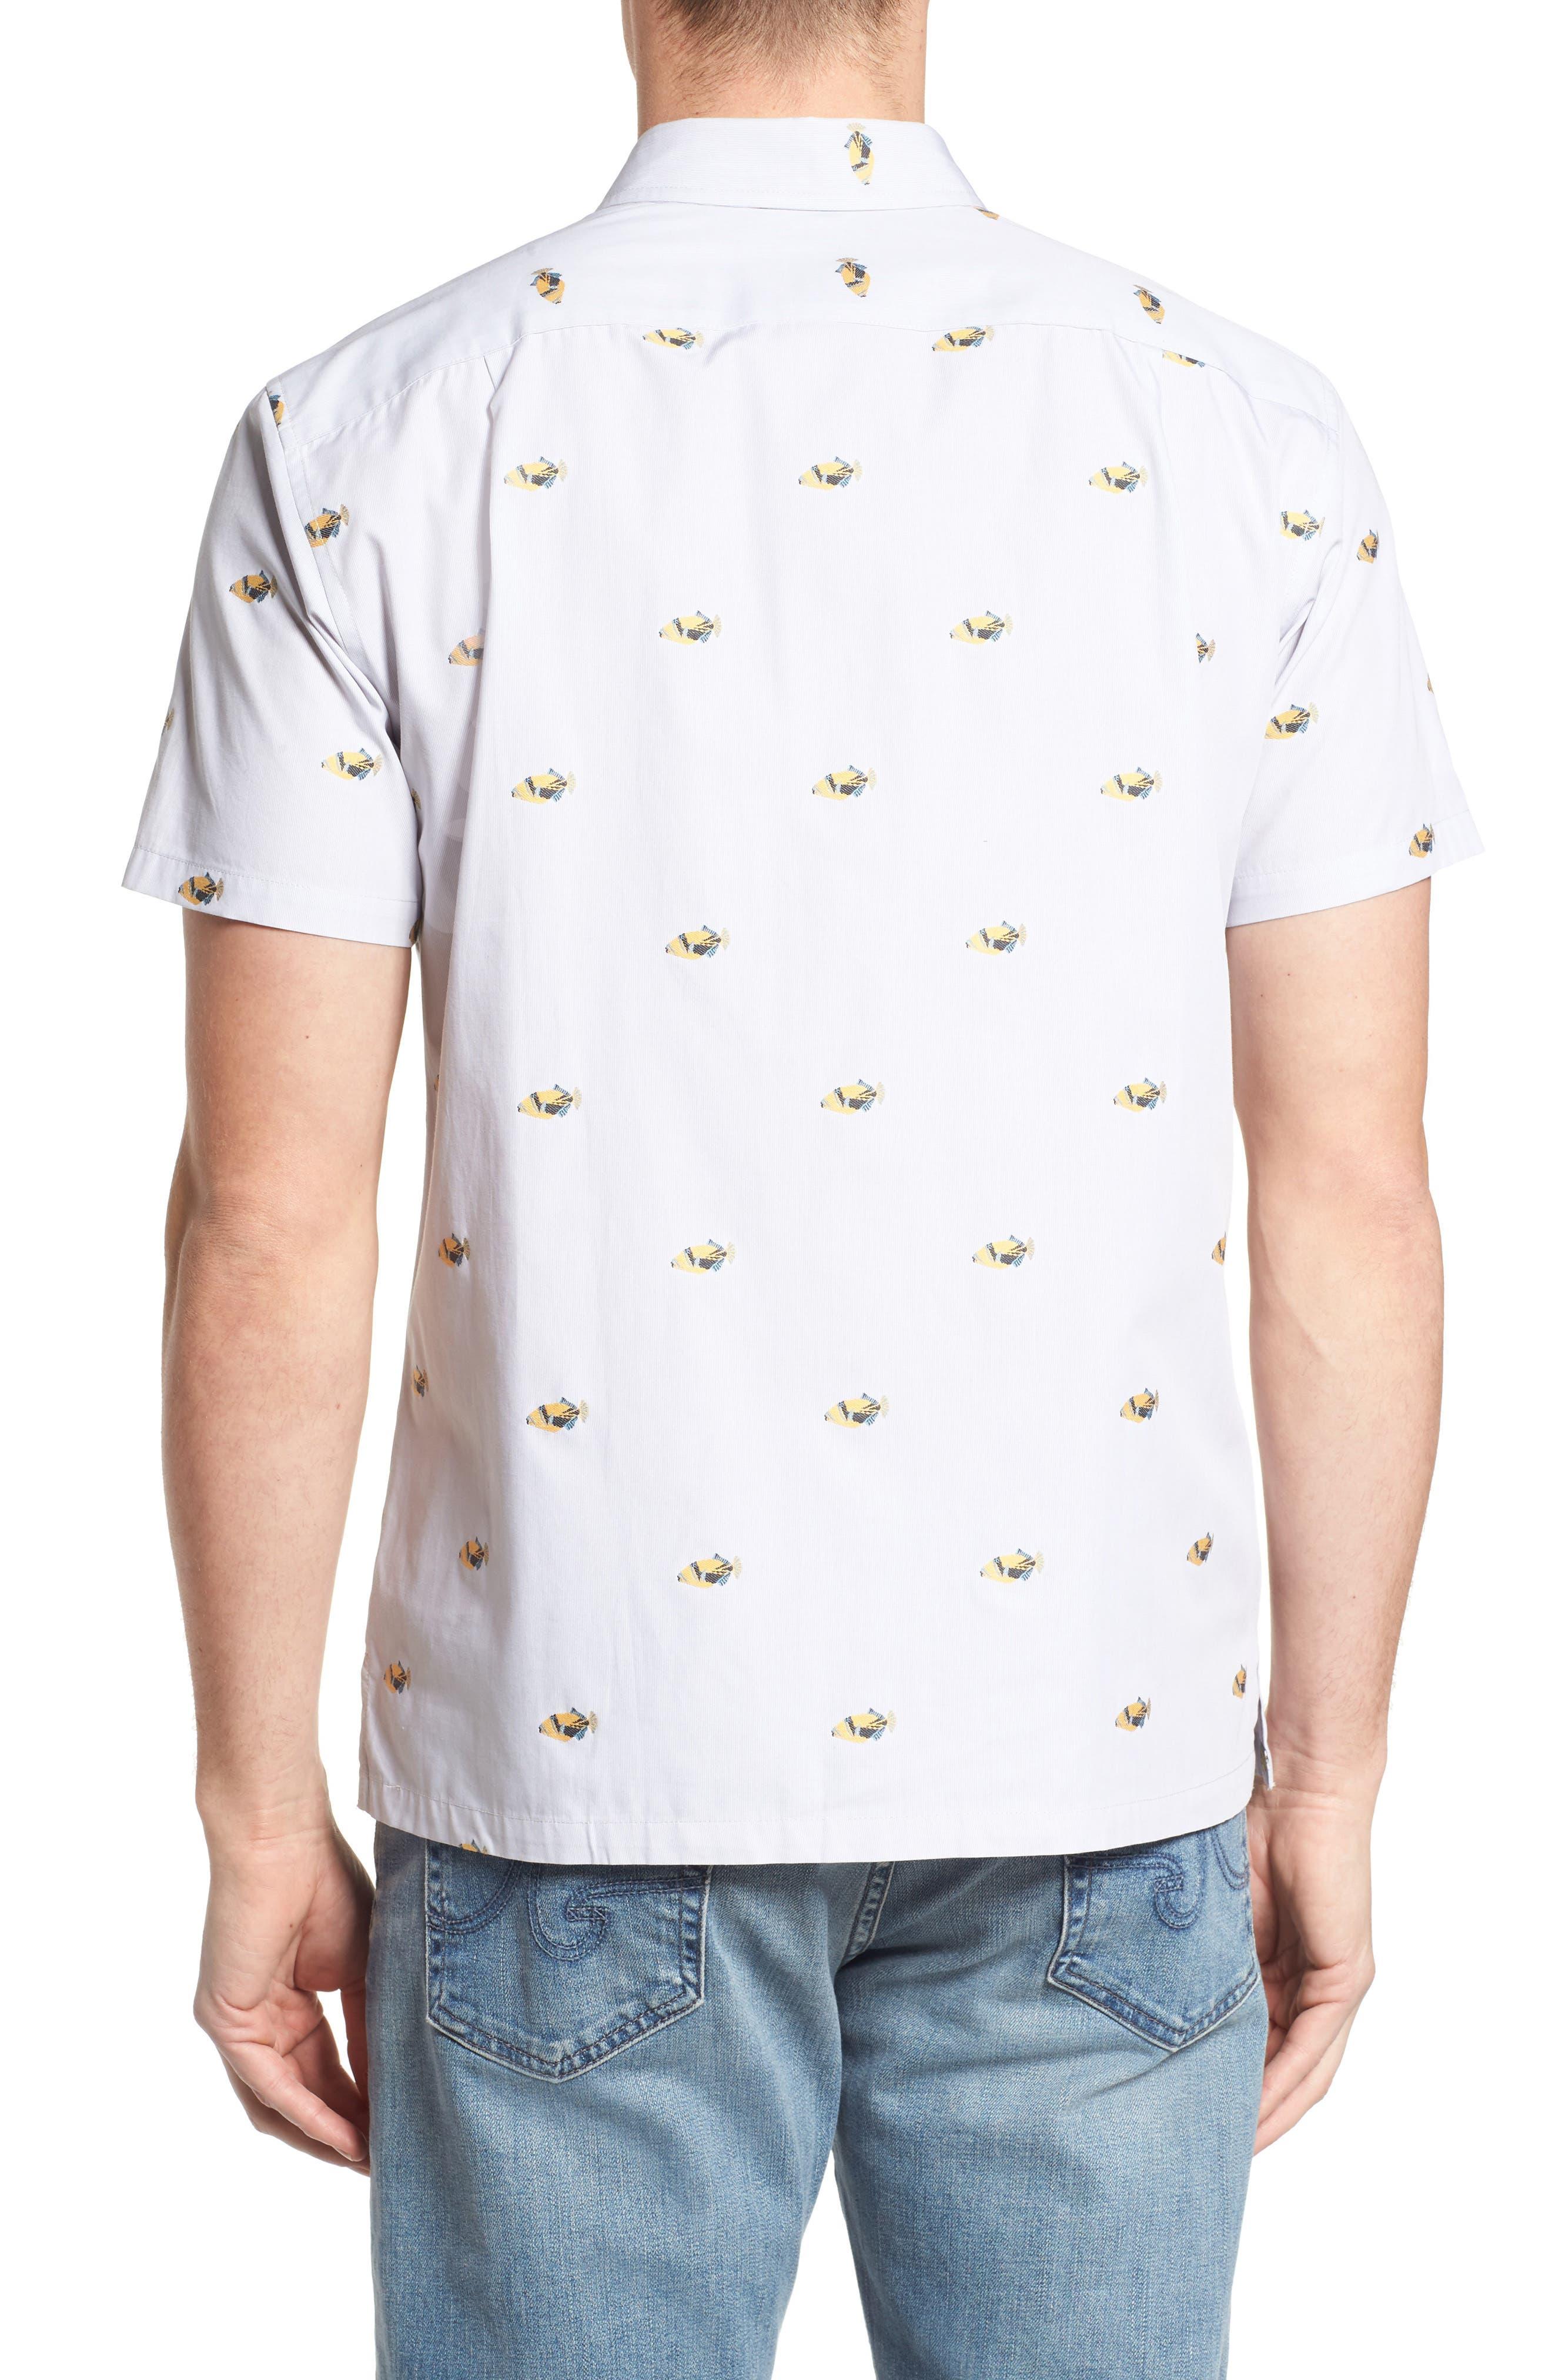 1Humu 2Humu Embroidered Sport Shirt,                             Alternate thumbnail 2, color,